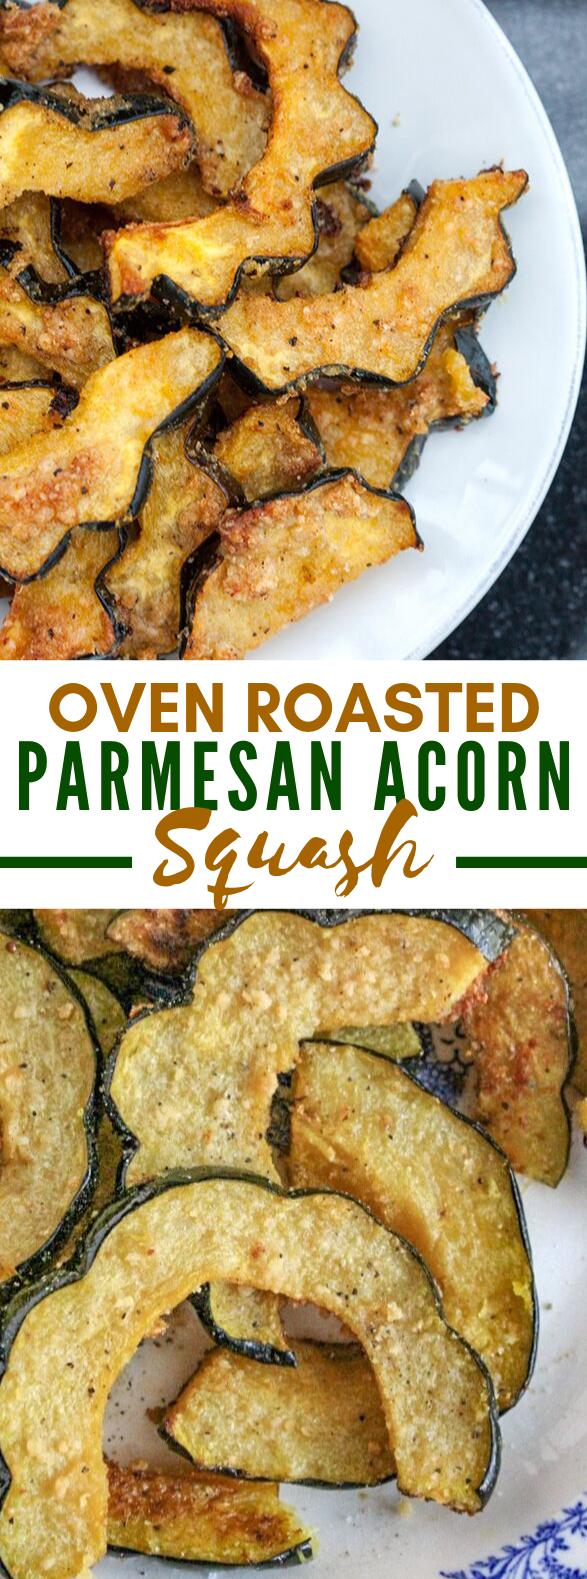 OVEN ROASTED PARMESAN ACORN SQUASH #vegetarian #thanksgiving